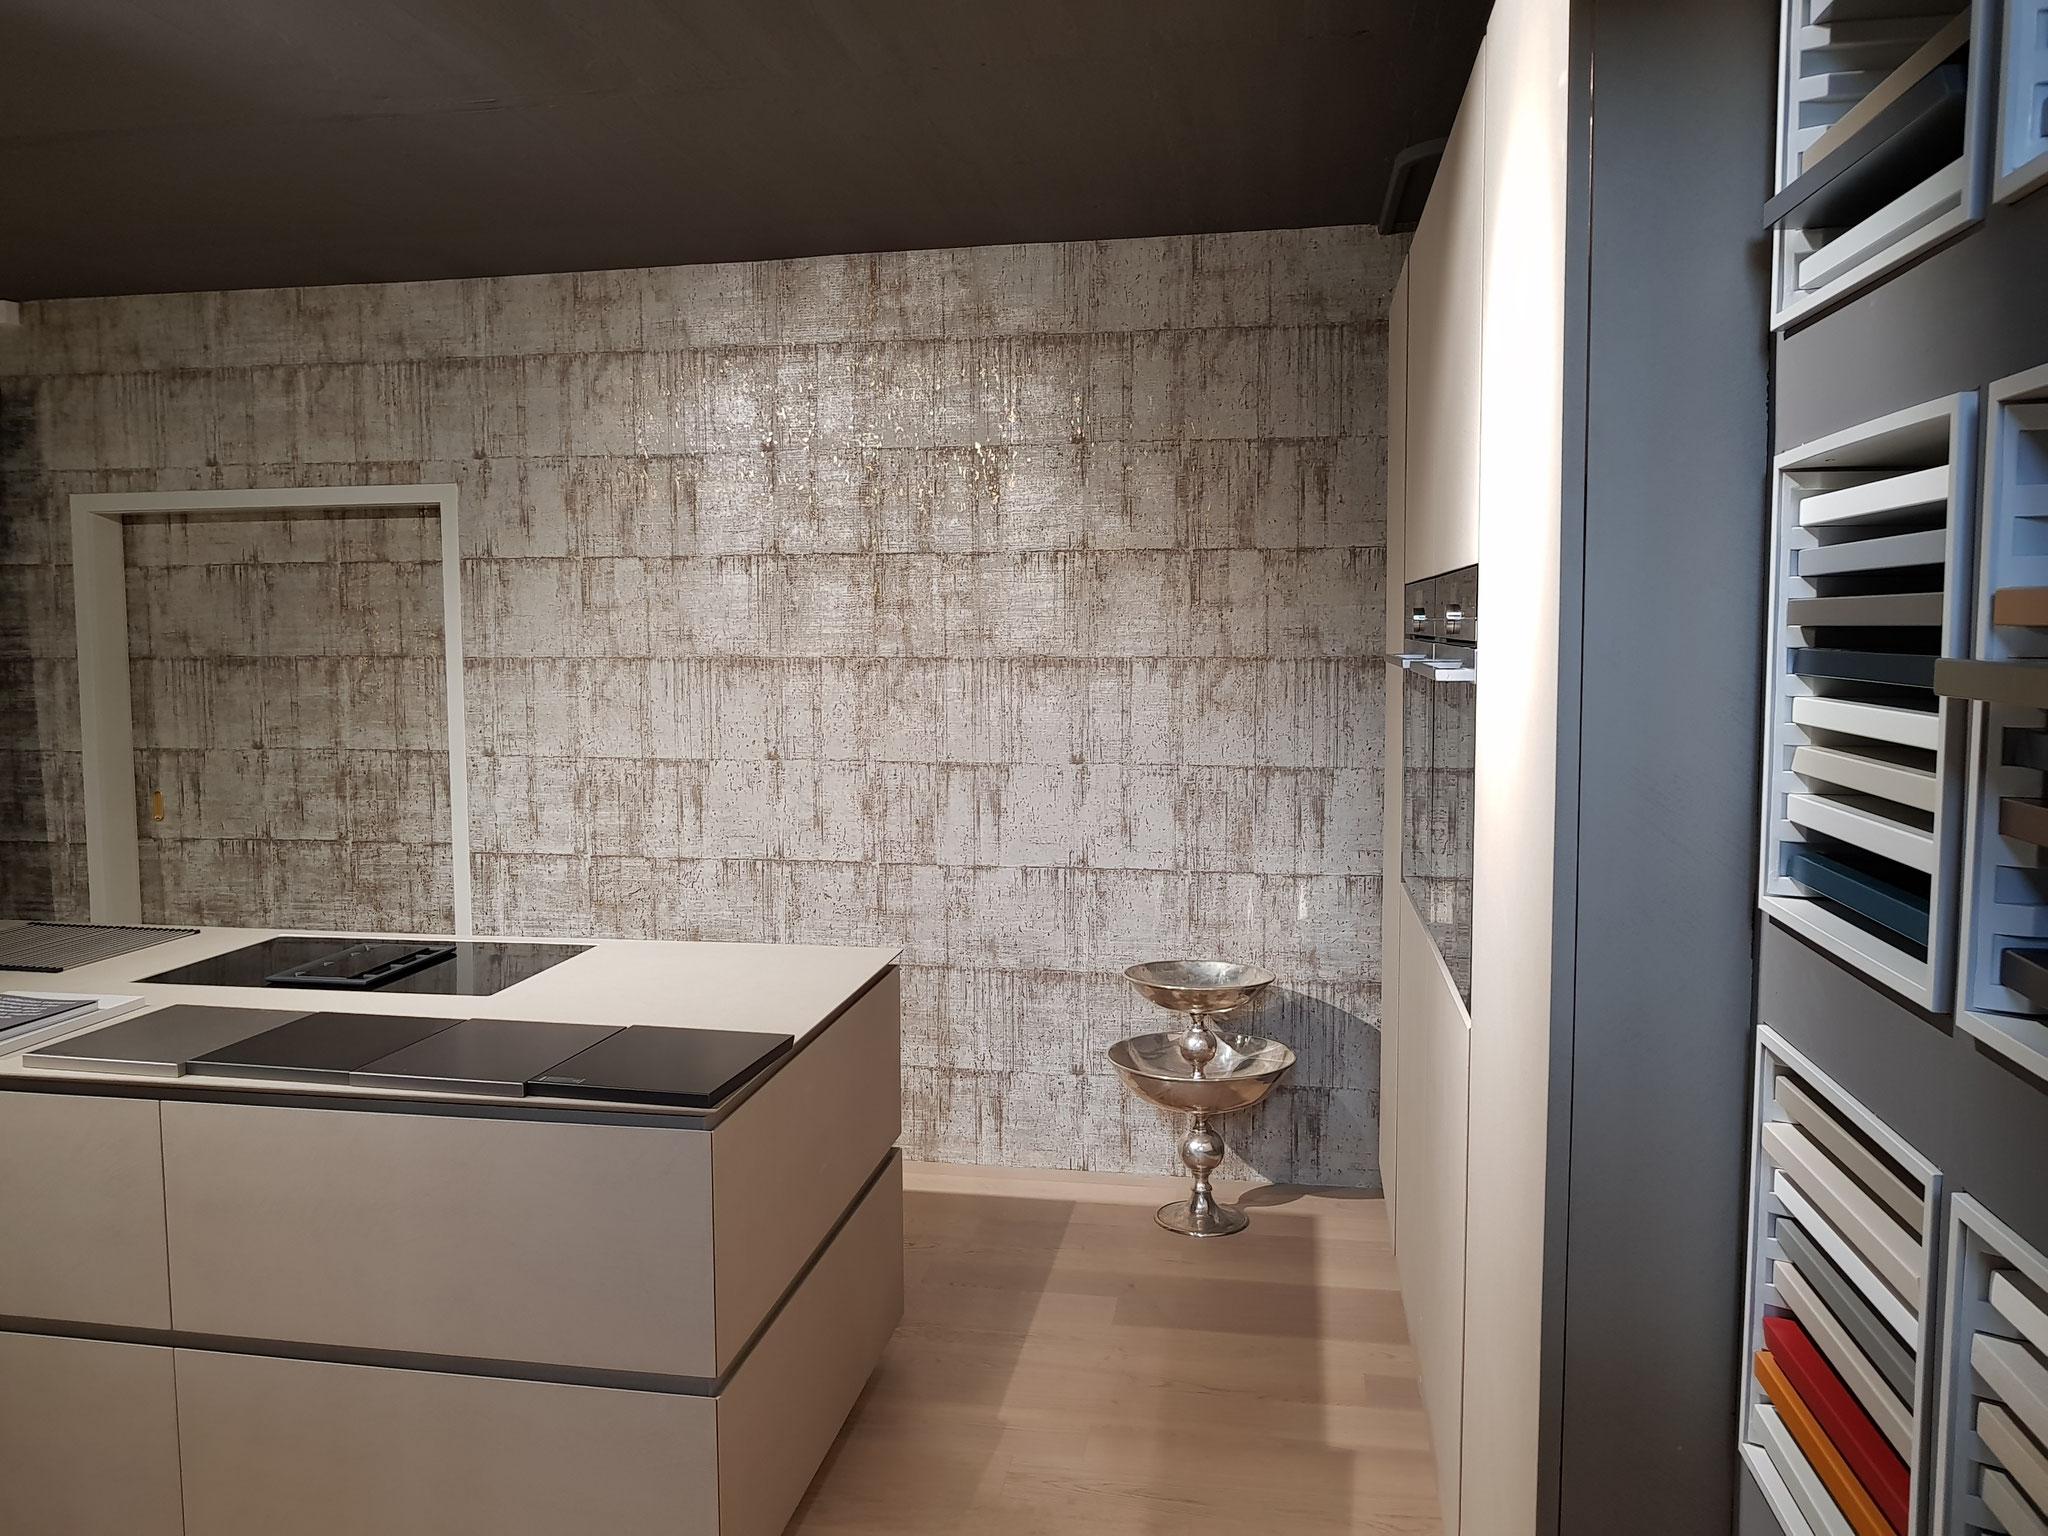 Kork-Goldtapete, Decuspena Küchen in Allschwil.